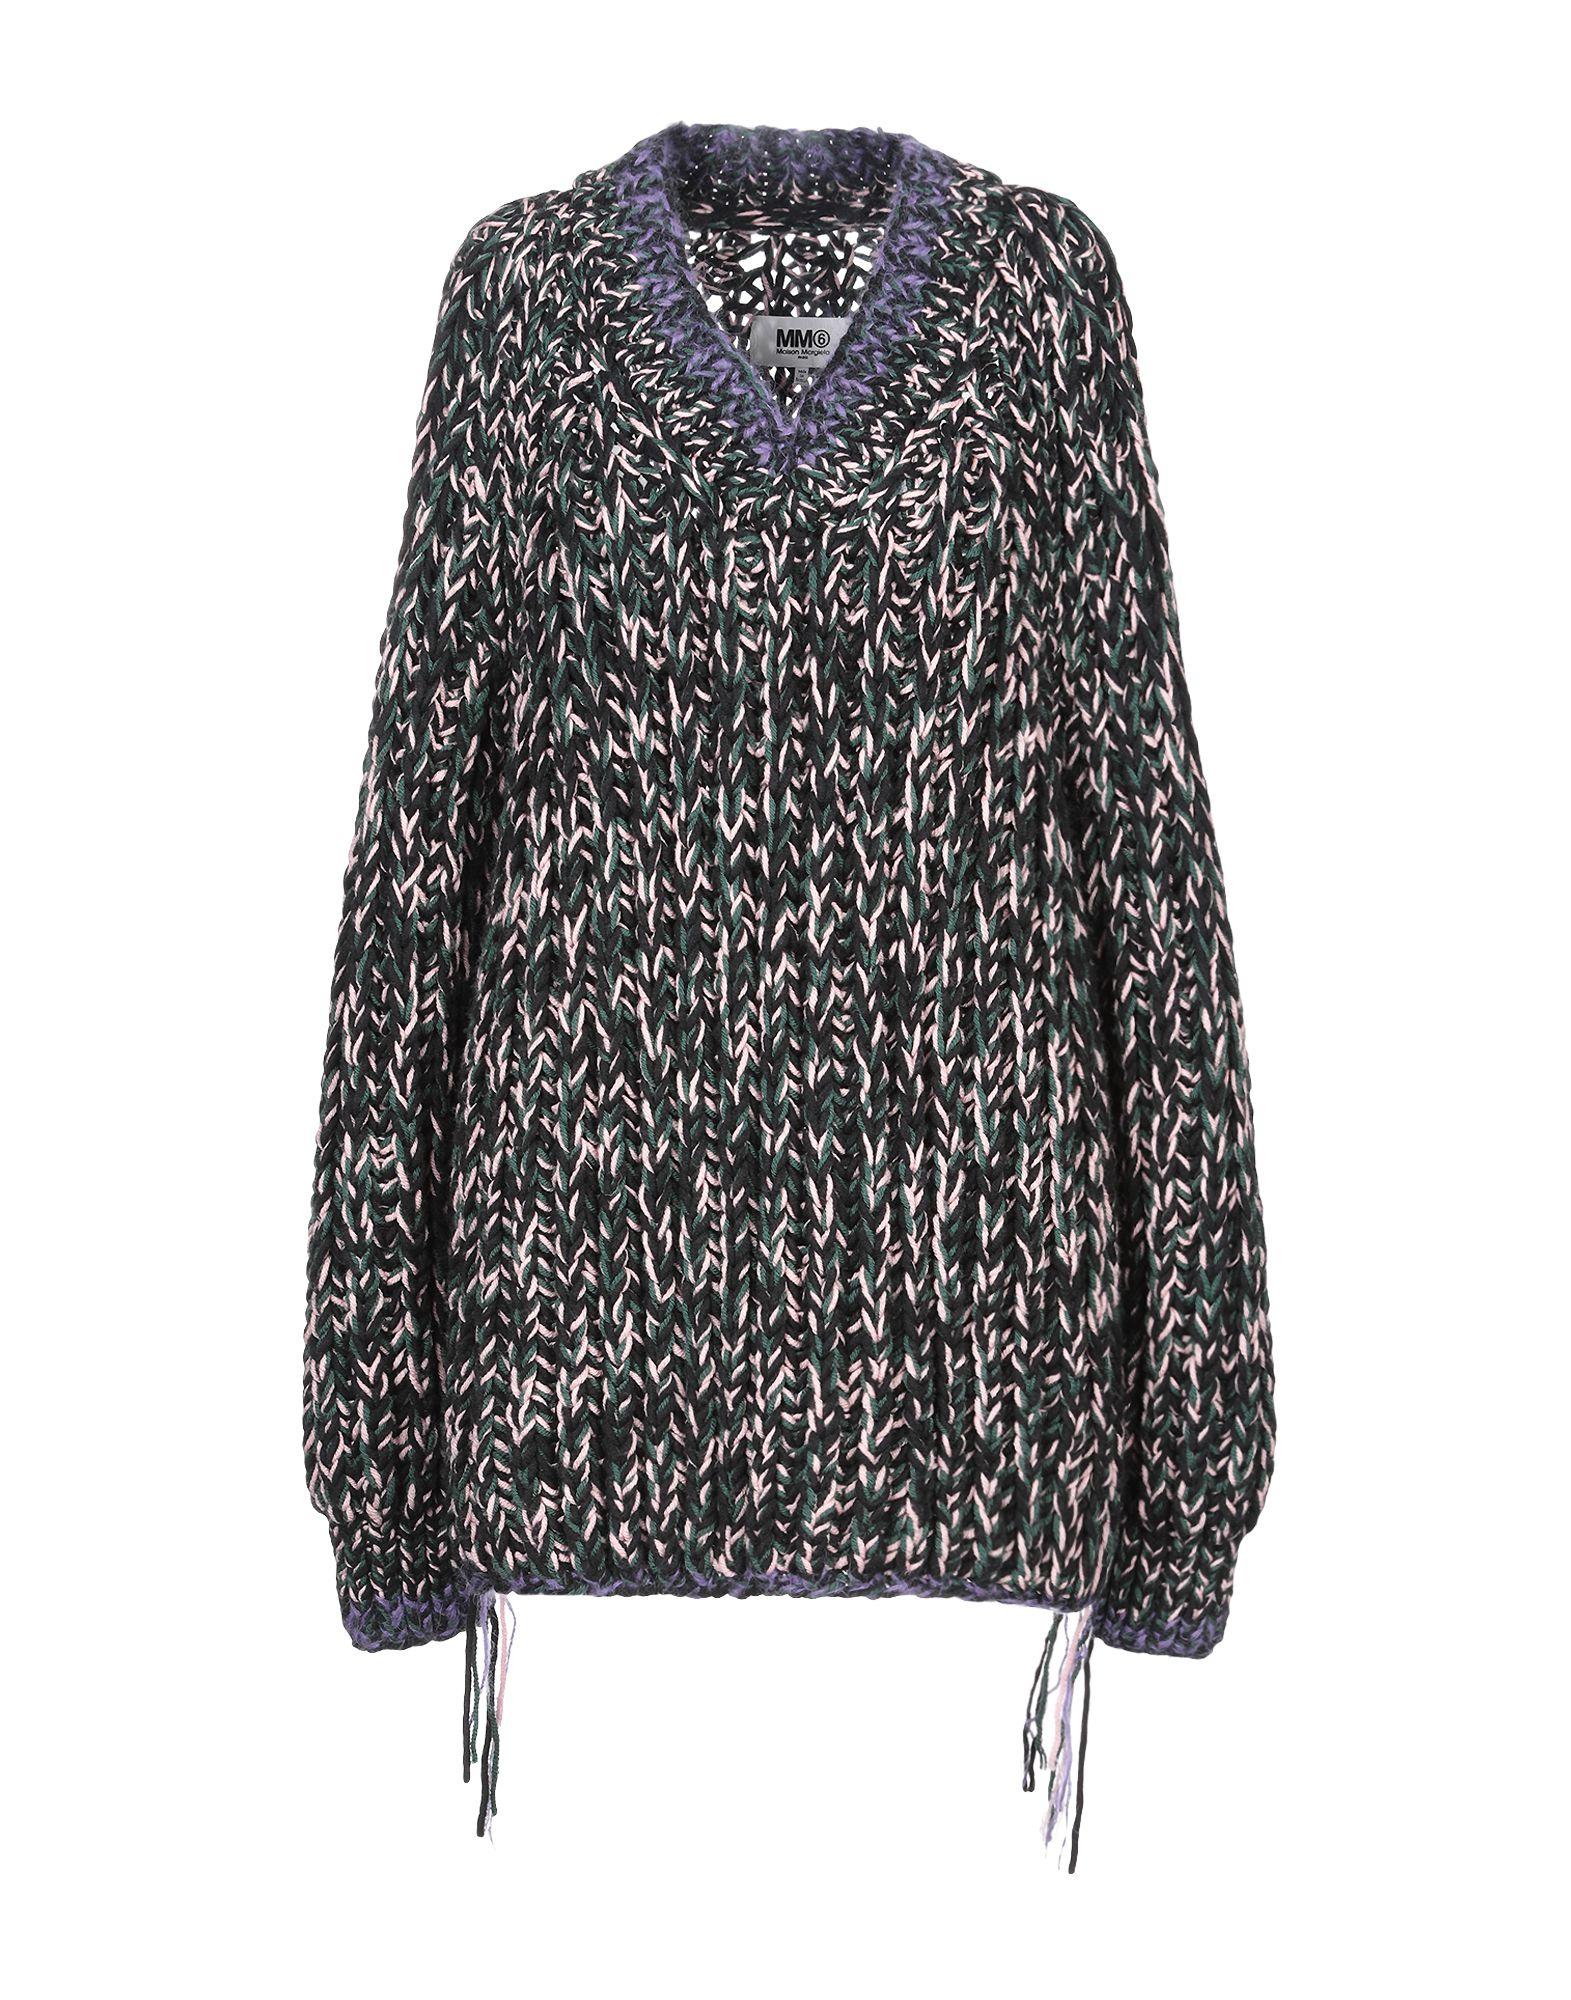 MM6 MAISON MARGIELA Свитер maison laviniaturra свитер